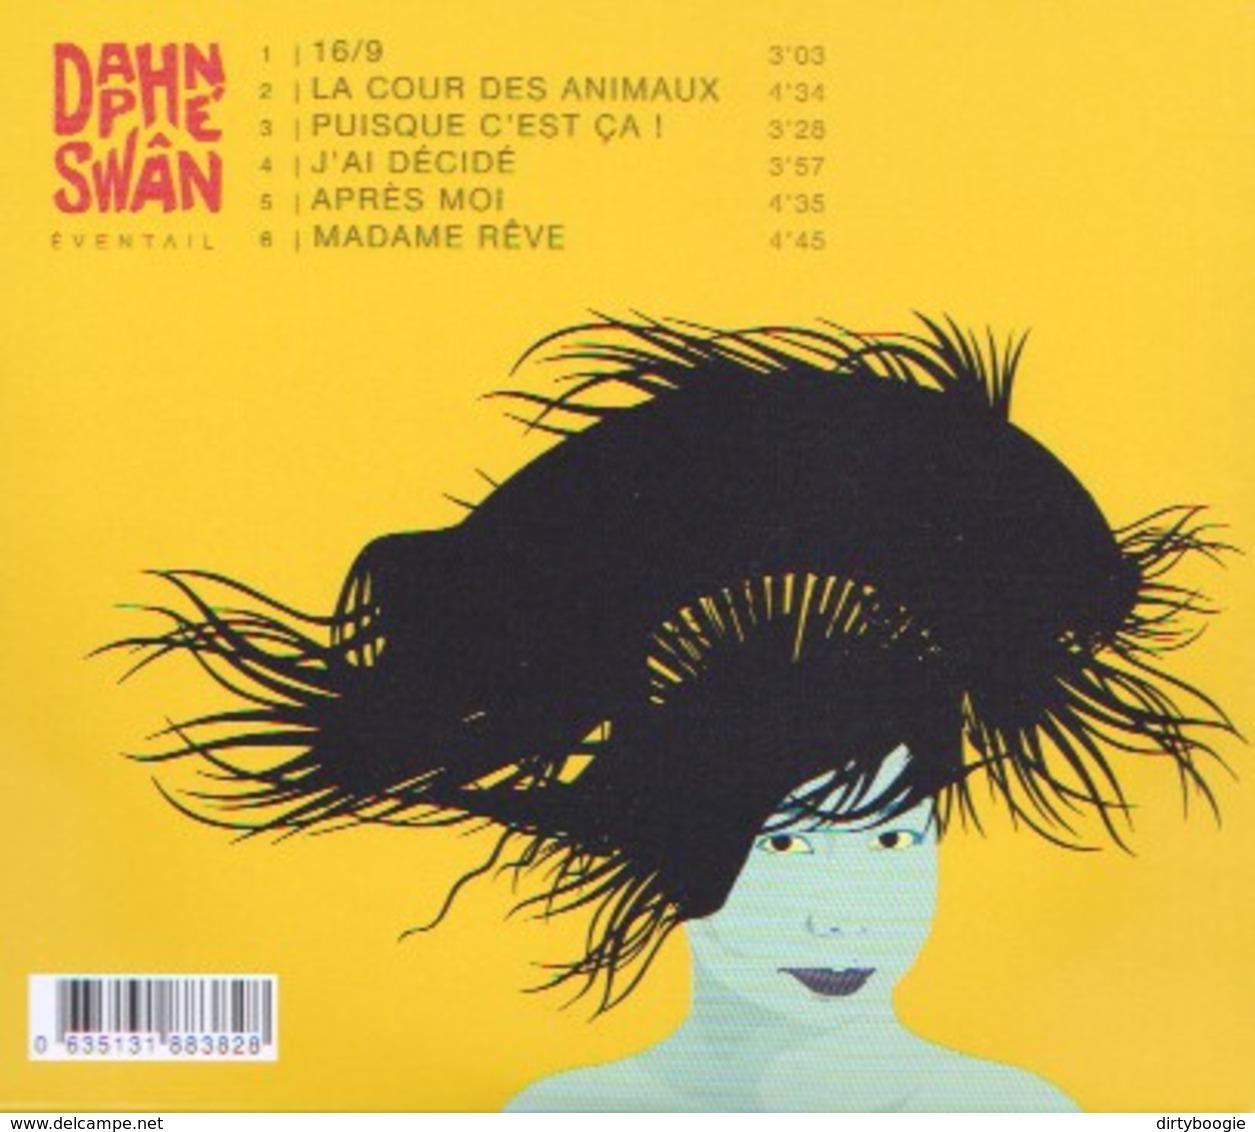 Daphé SWÂN - Eventail - CD - CHANSON FRANCAISE - Alain BASHUNG - Musik & Instrumente